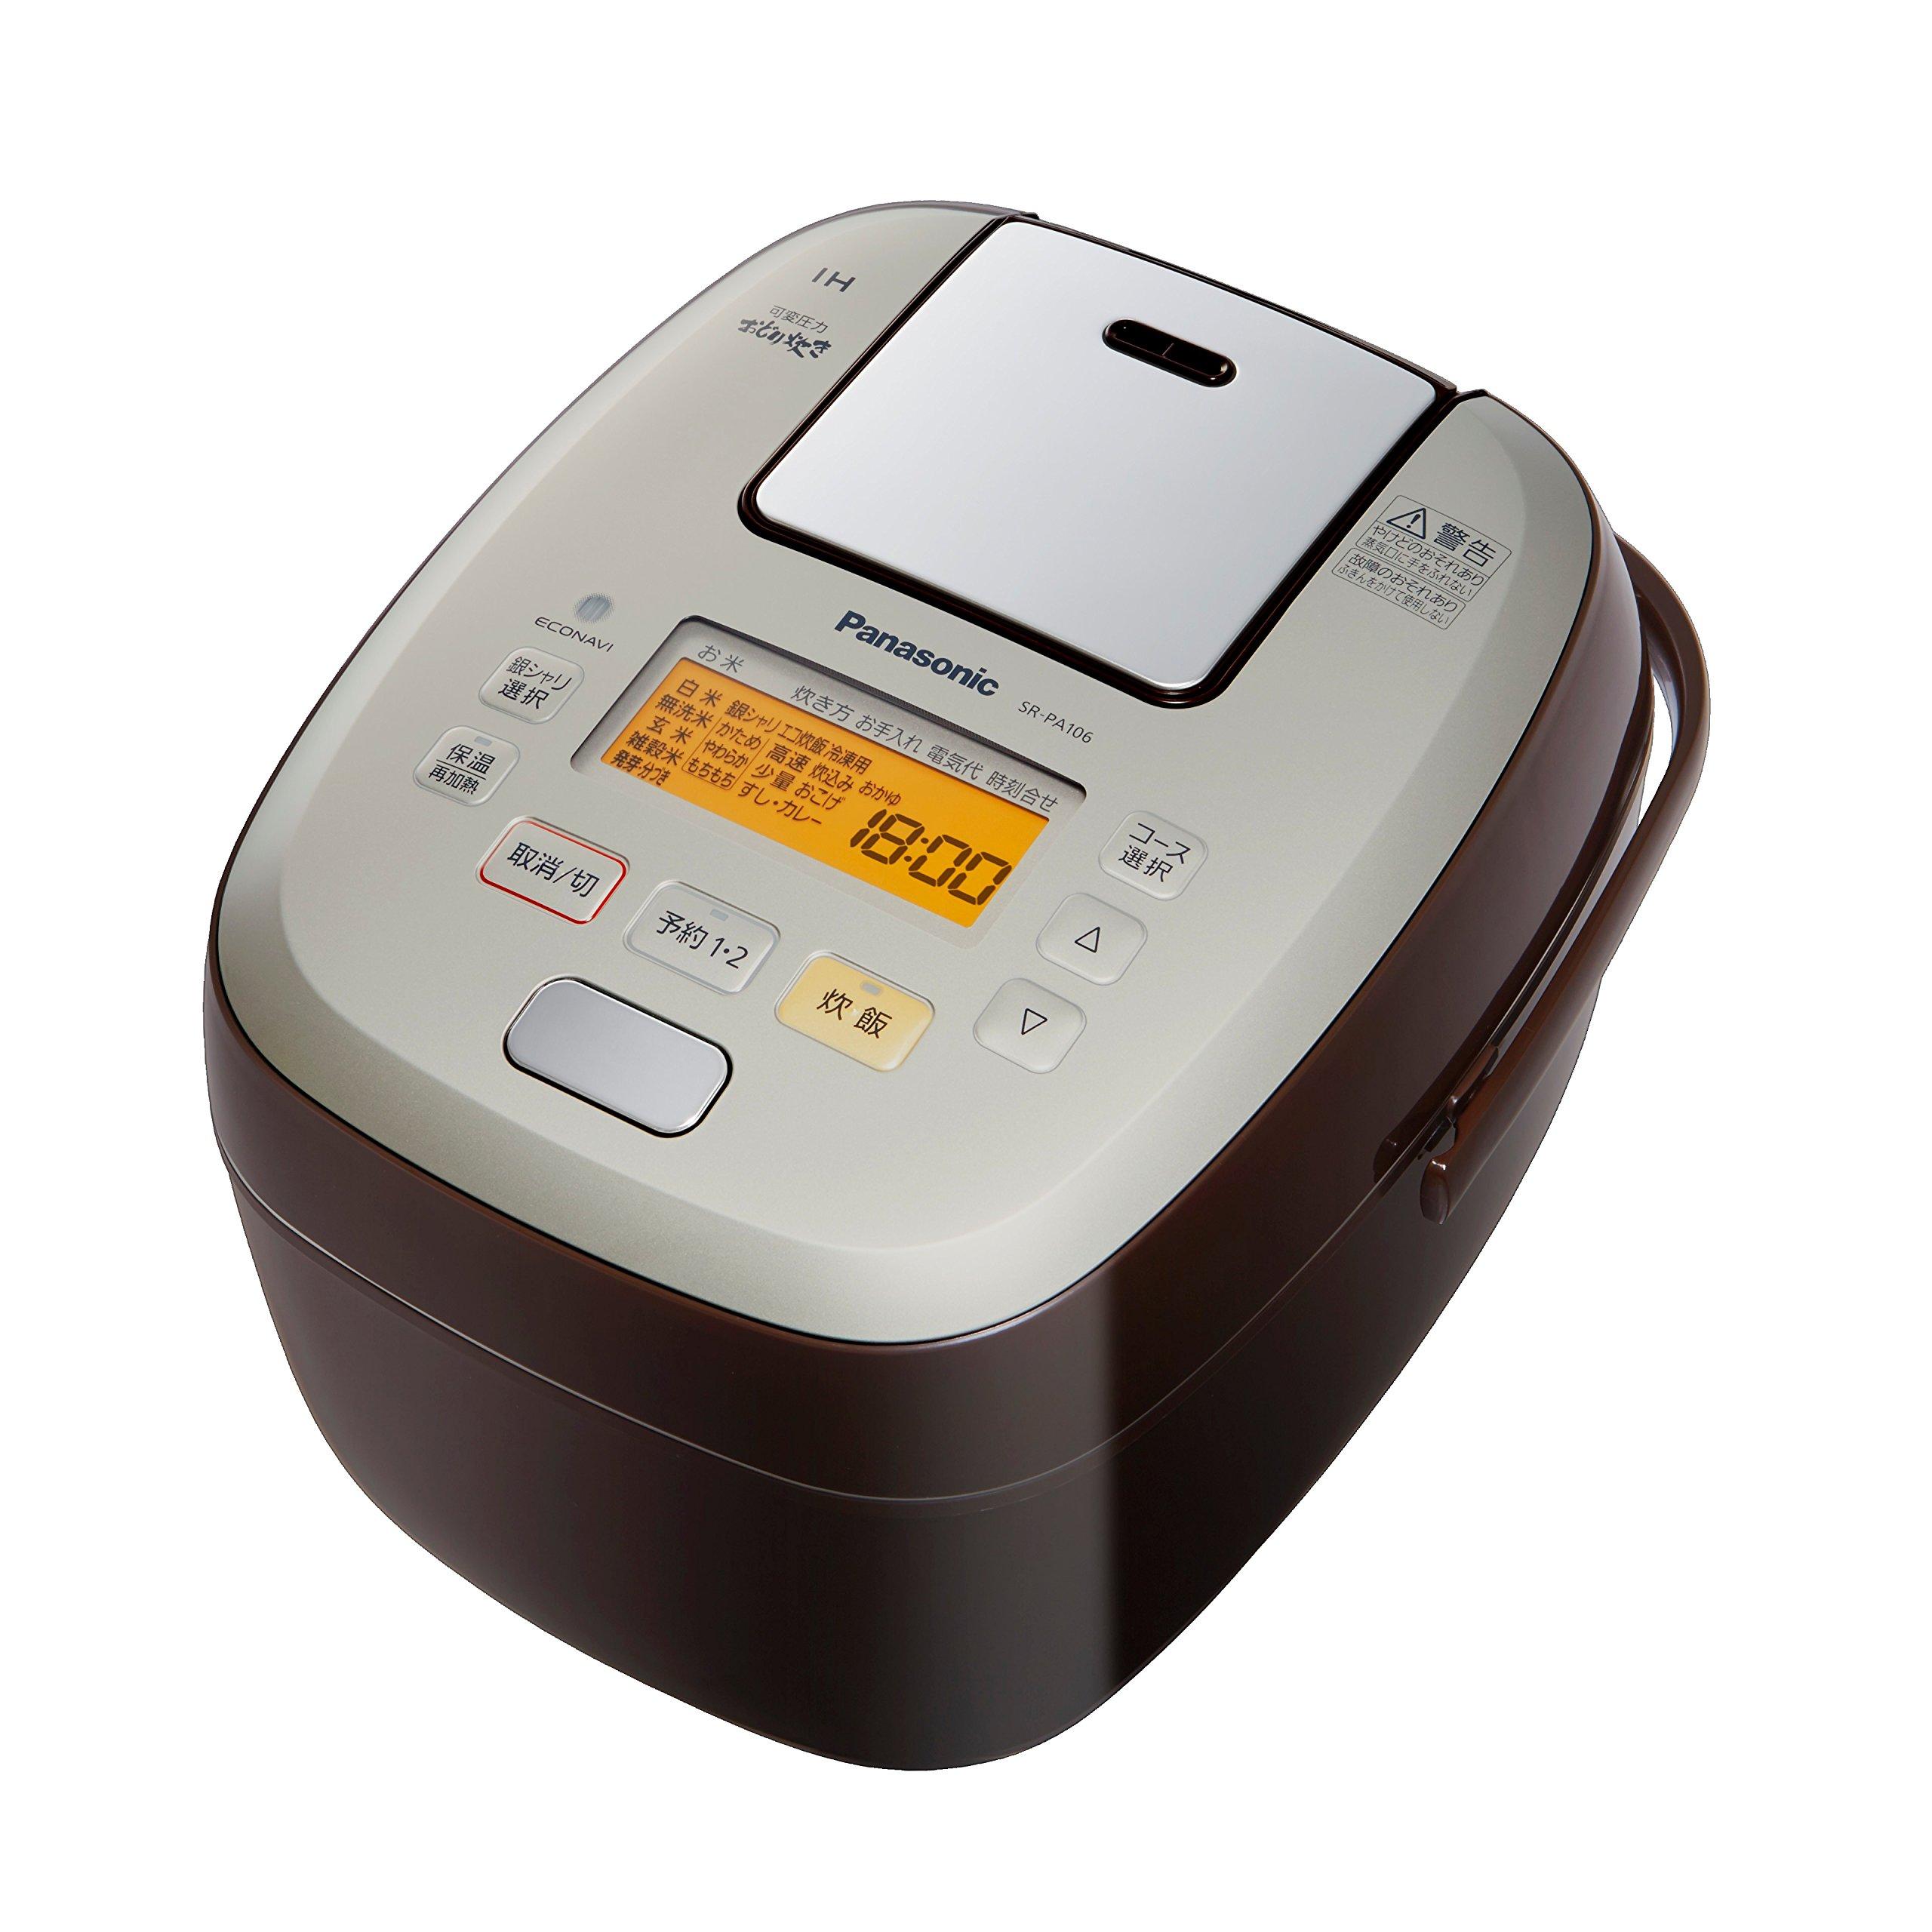 5.5 Go rice cooker pressure IH formula Panasonic dance cook Brown SR-PA106-T